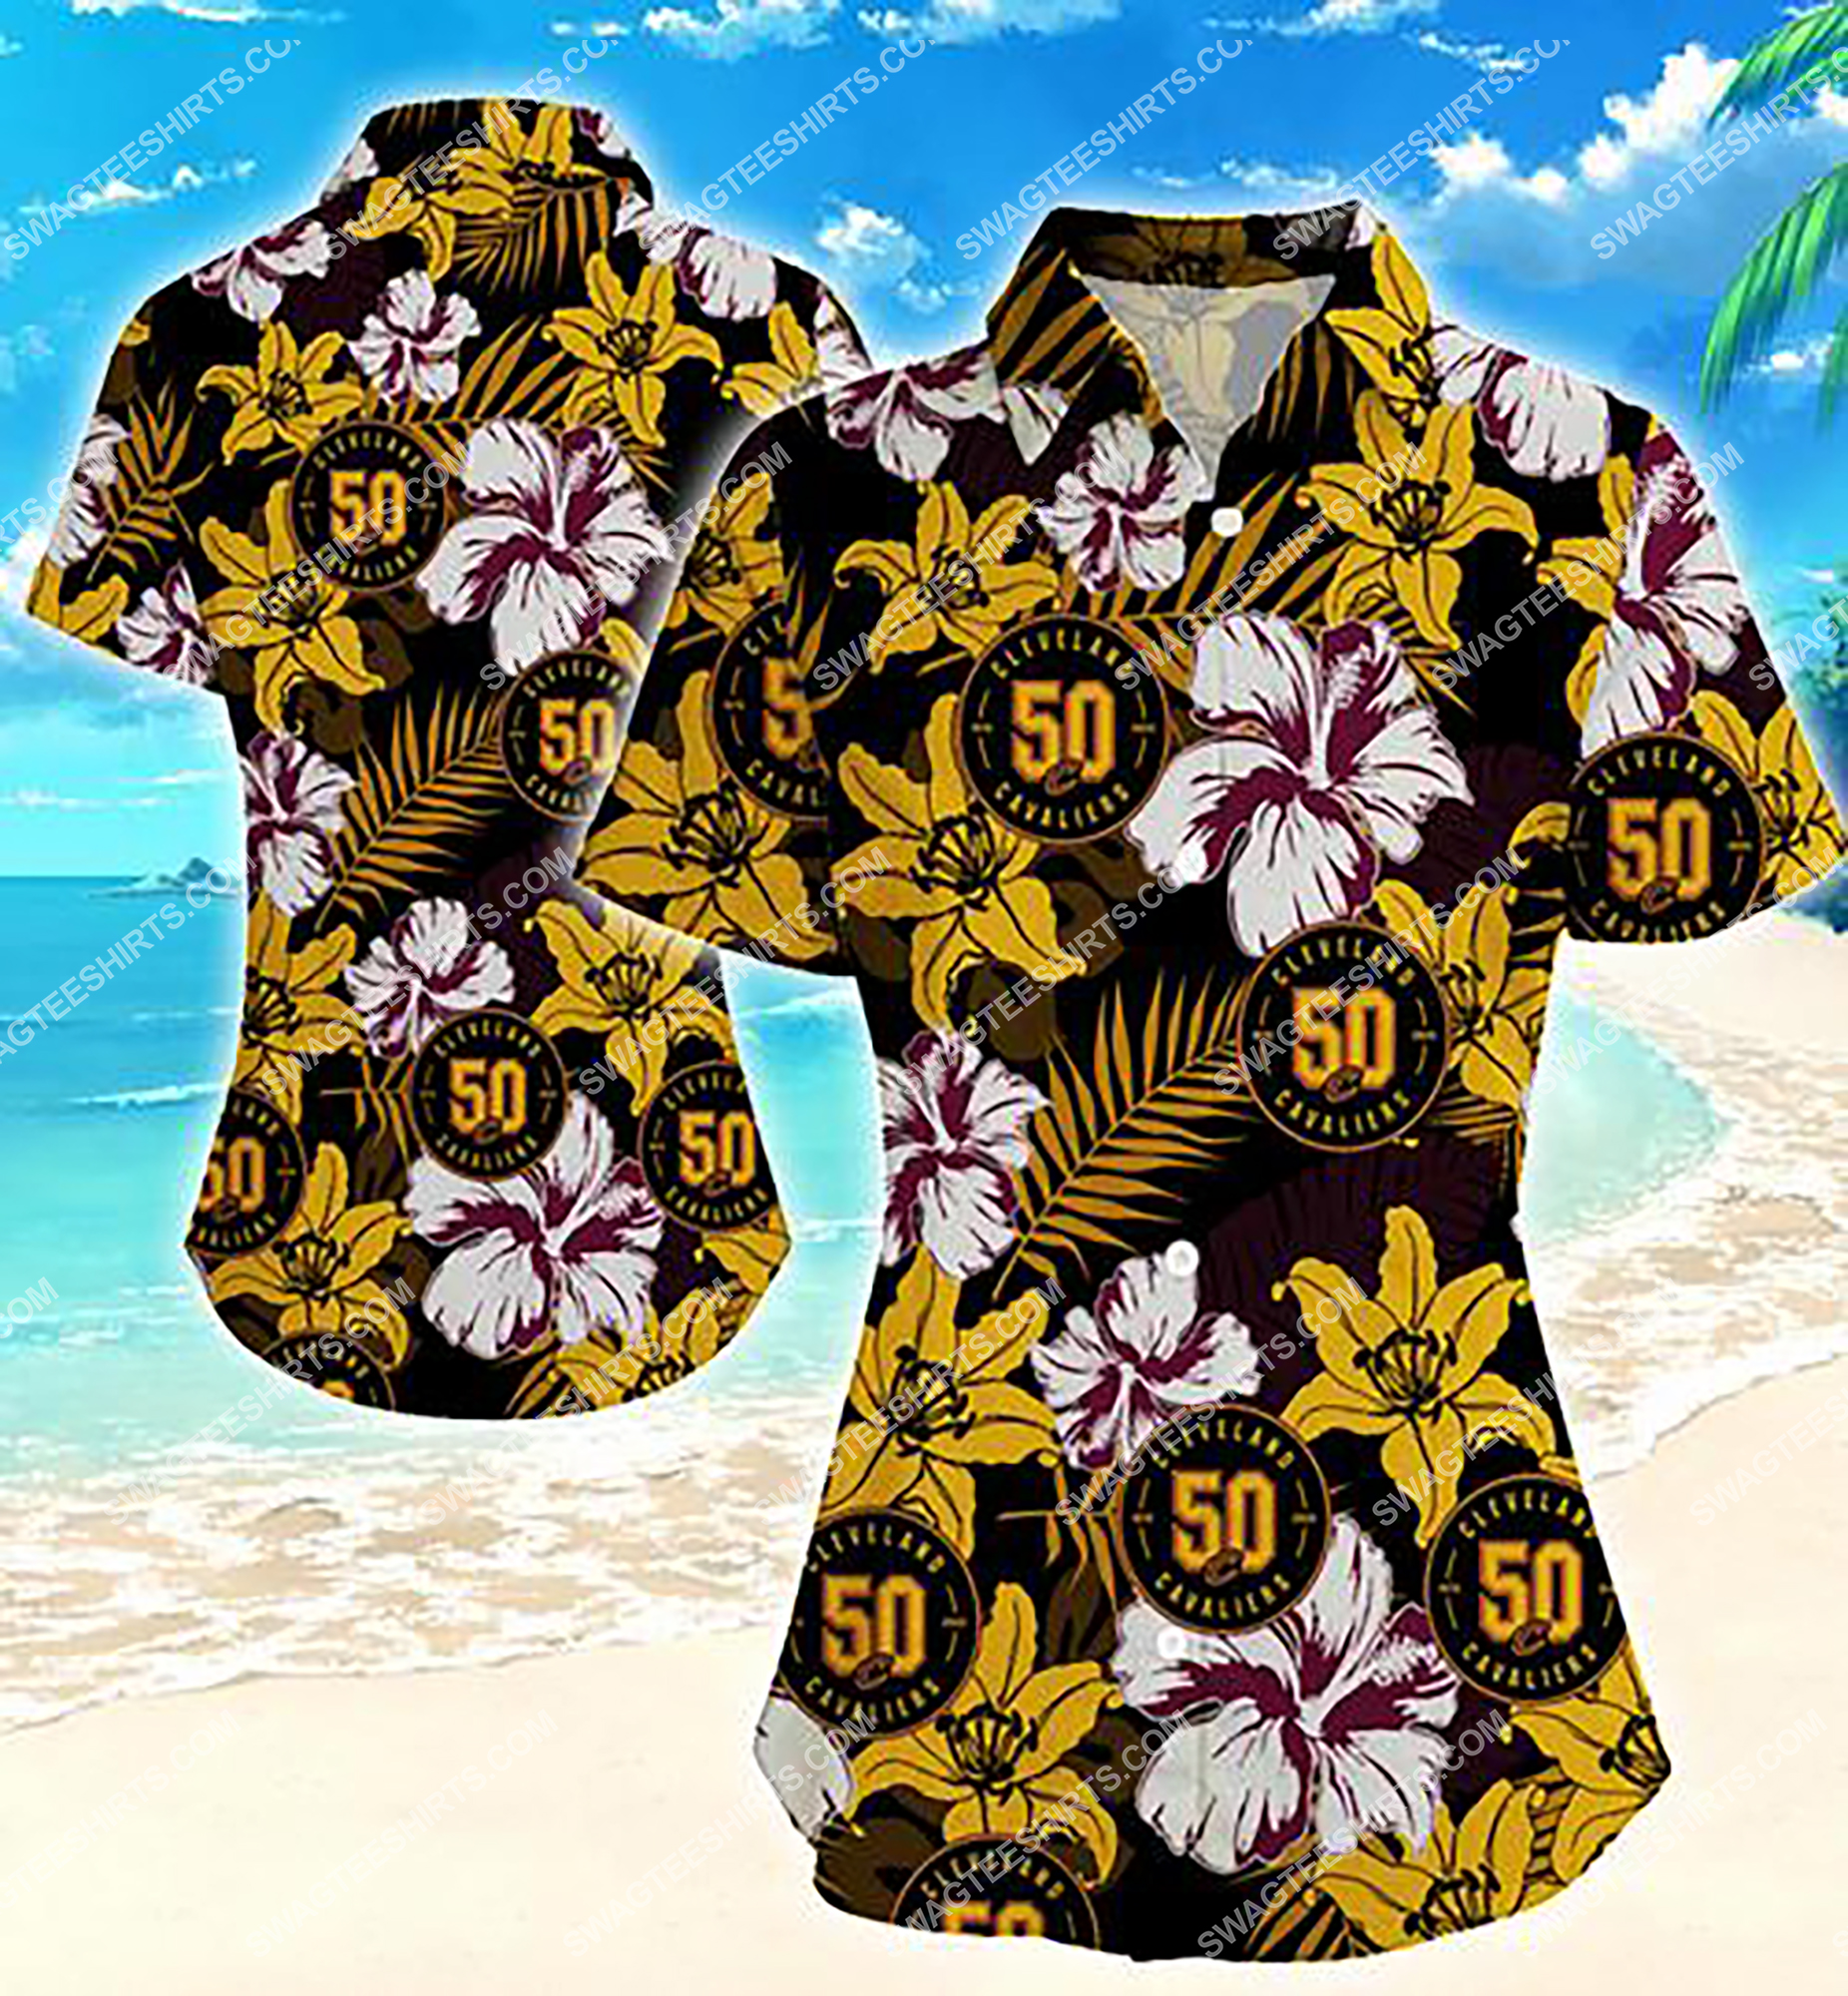 national basketball association cleveland cavaliers team hawaiian shirt 2 - Copy (2)